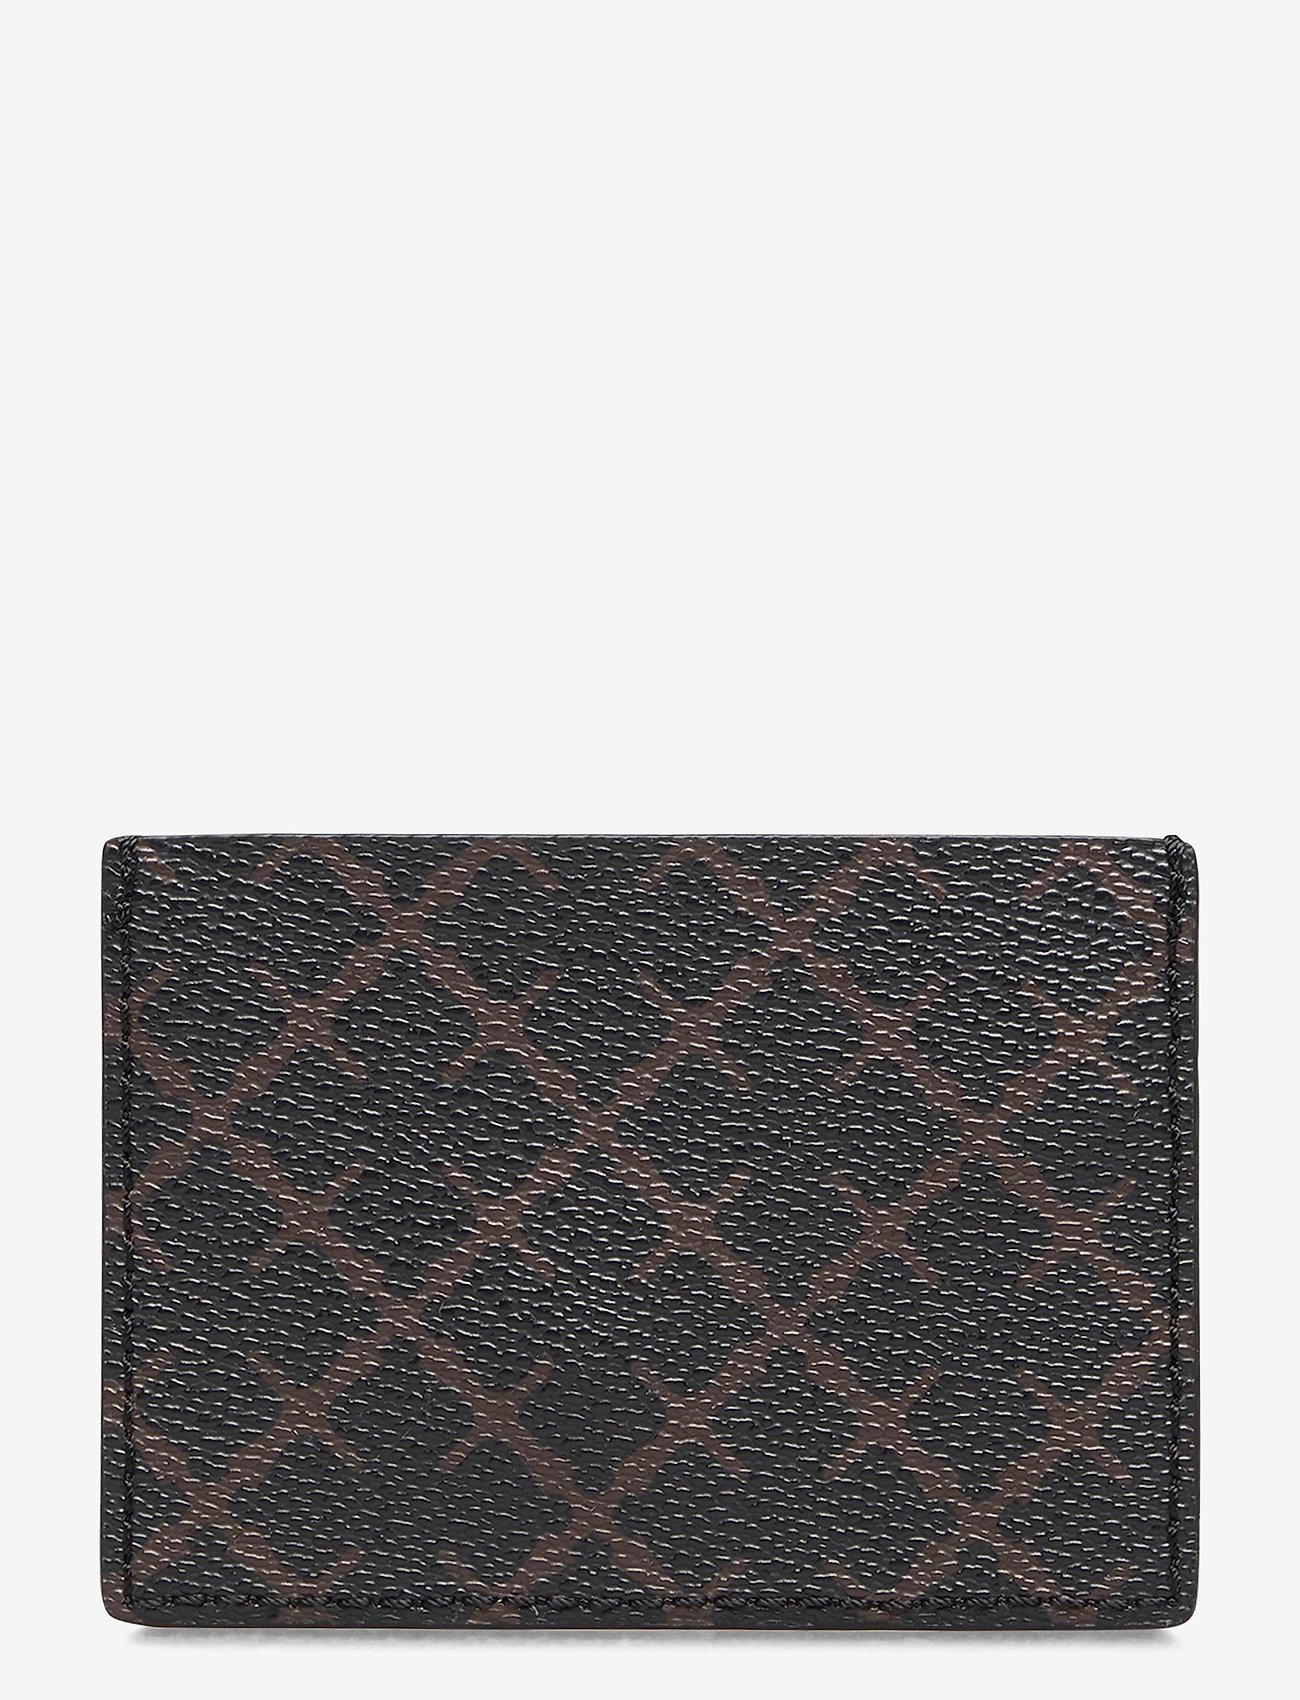 Elia Card (Dark Chokolate) (55 €) - By Malene Birger 8MZIh